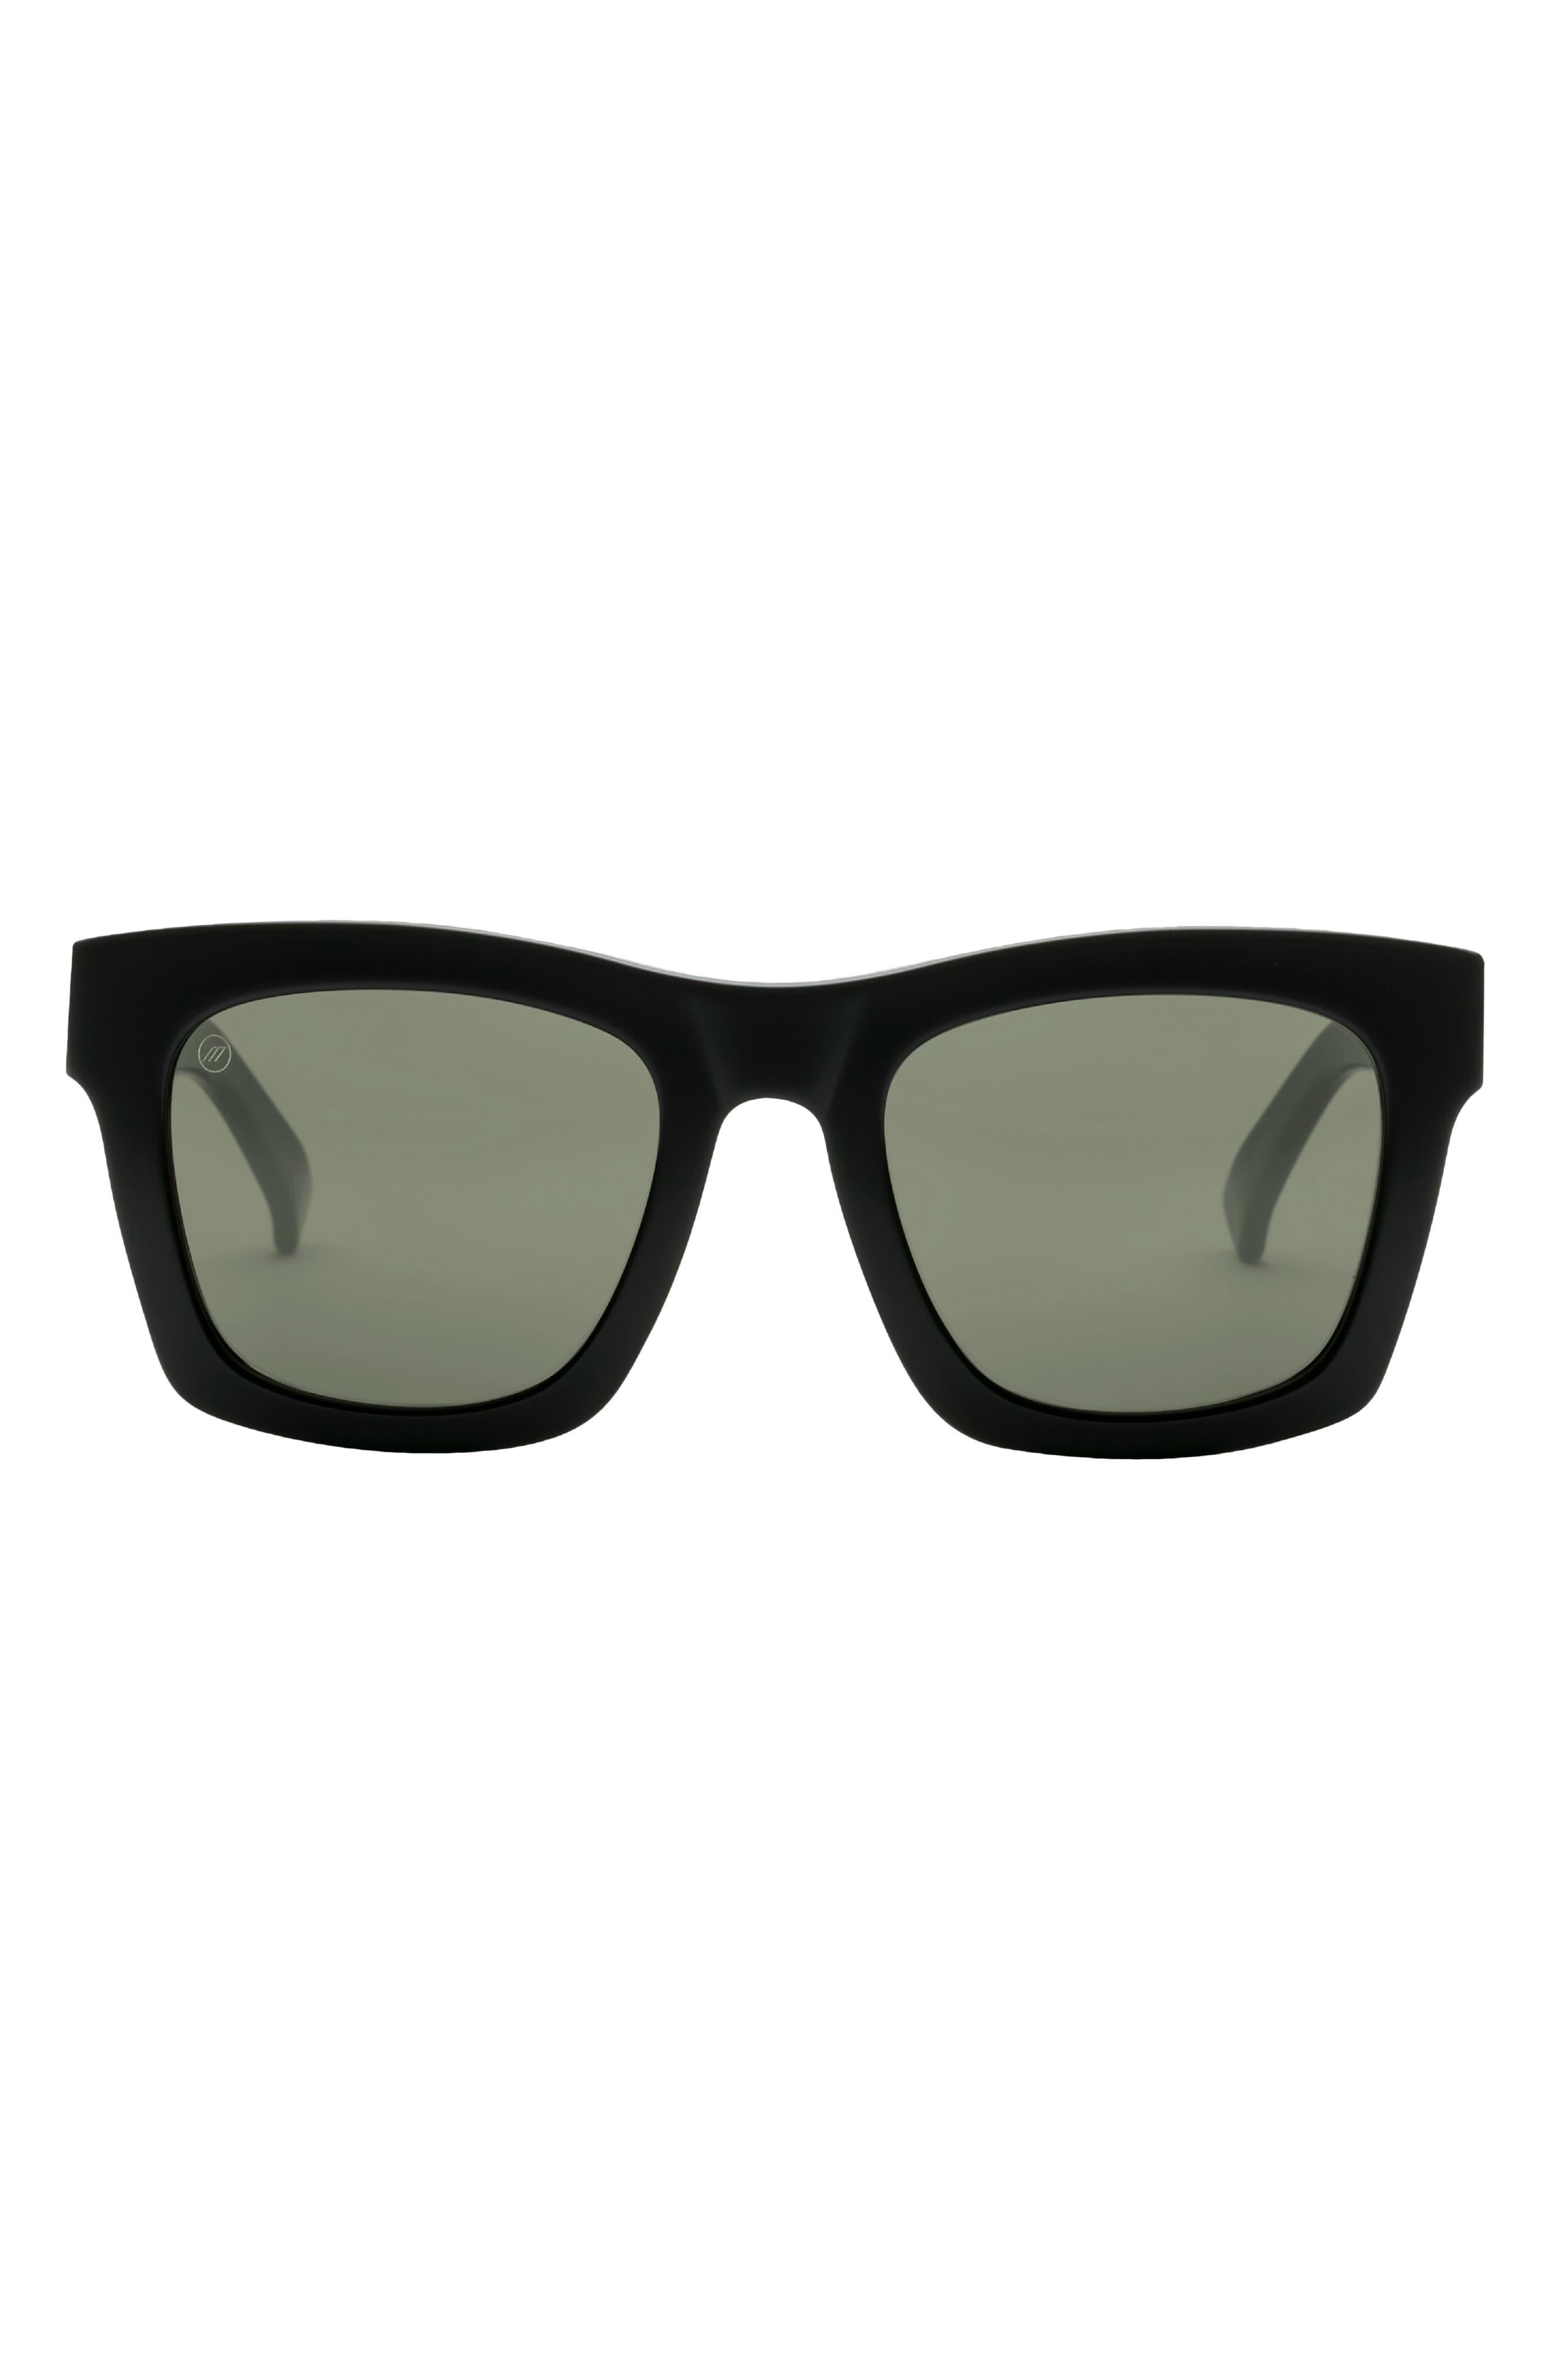 Crasher 54mm Polarized Square Sunglasses